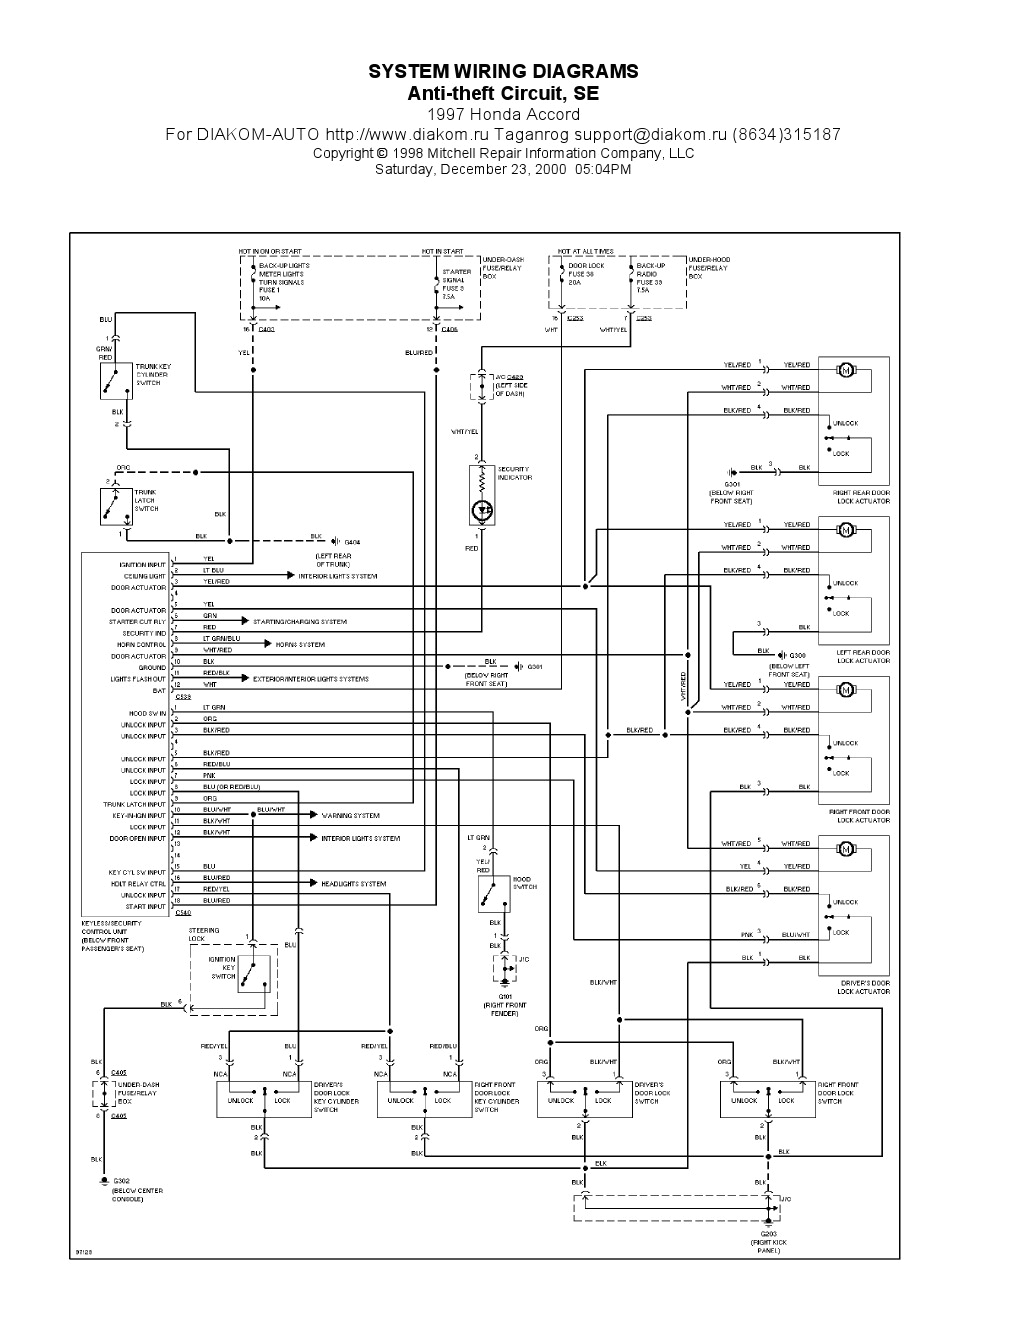 94 honda accord wiring wiring diagram article review 94 honda accord distributor wiring diagram 1994 honda